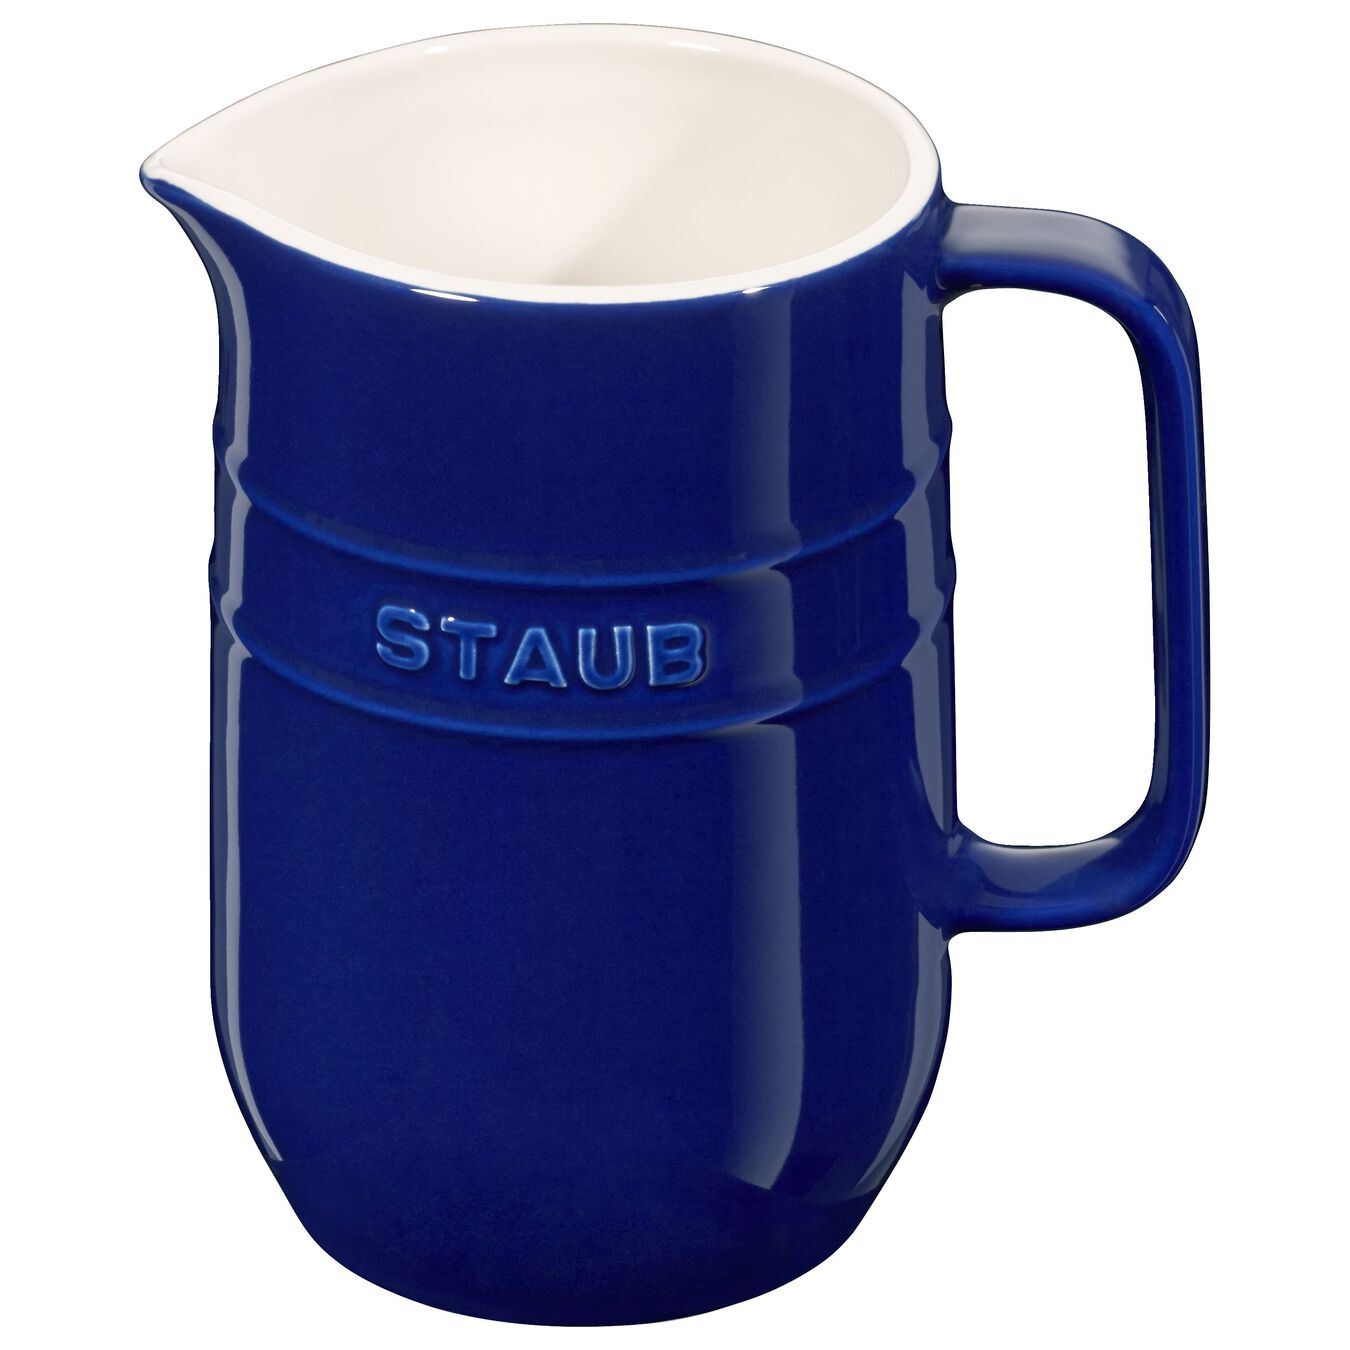 1 l Ceramic Pitcher, Dark-Blue,,large 1